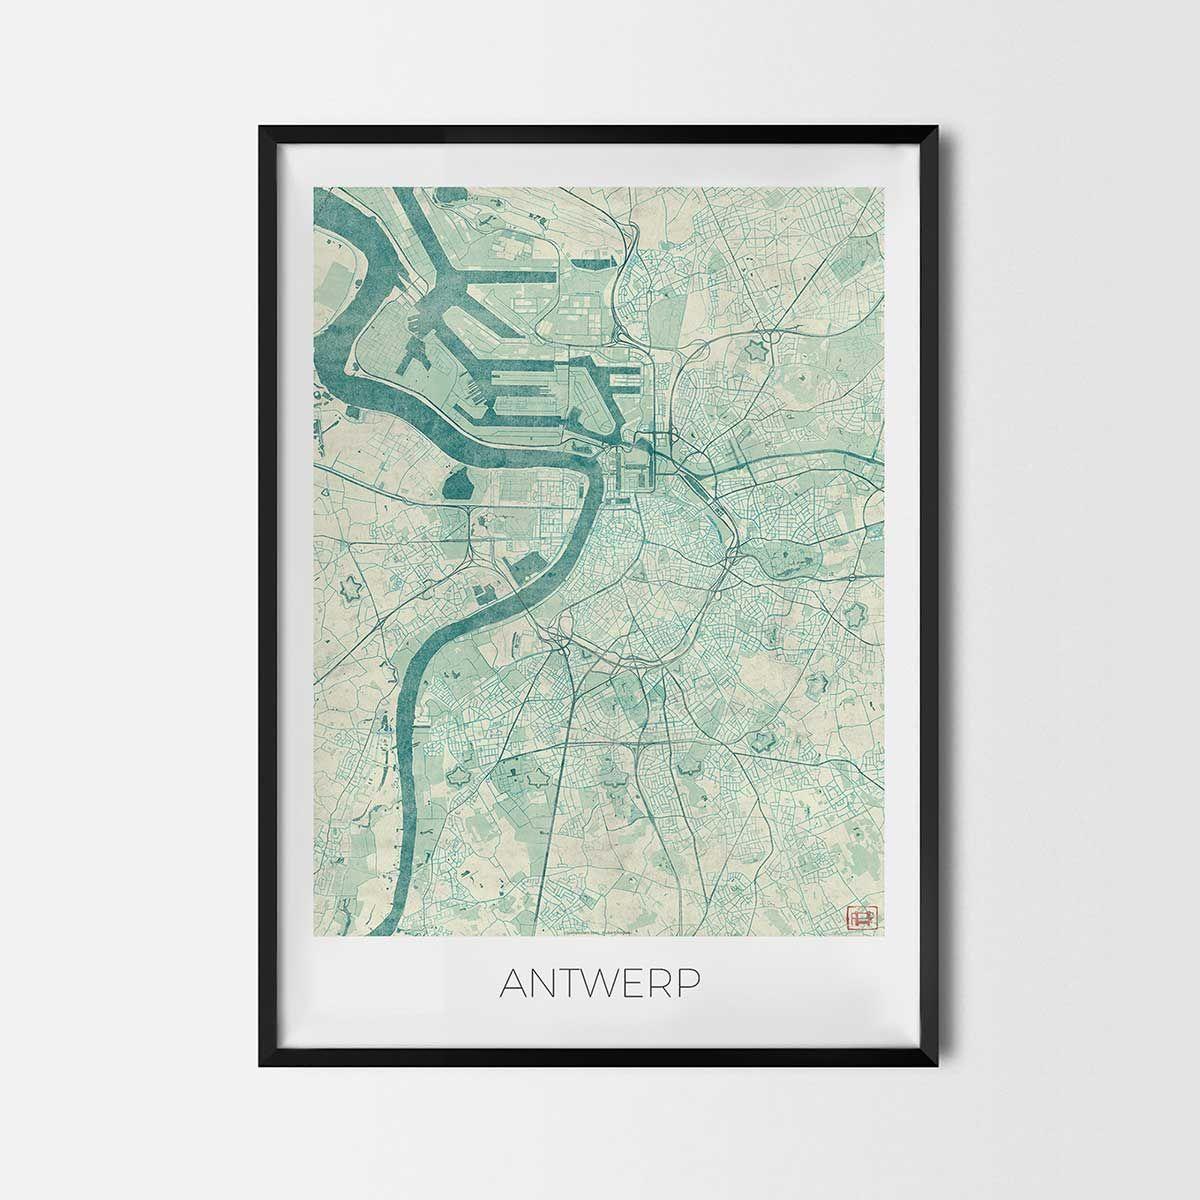 Antwerp Art Posters City Art Map Posters And Prints Map Art Poster Art City Art